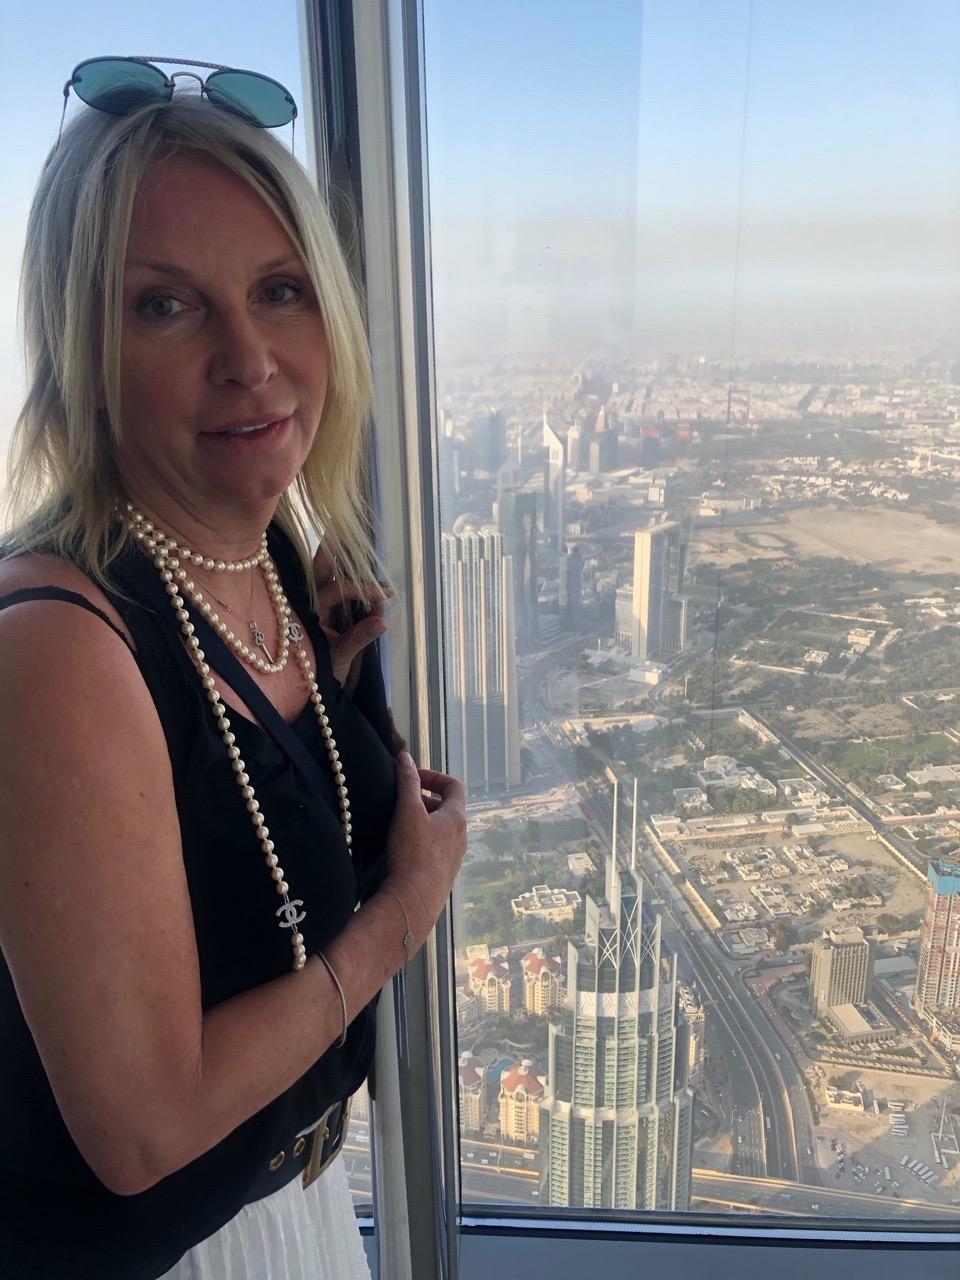 BlogStar: Randka w Dubaju - BlogStar.pl